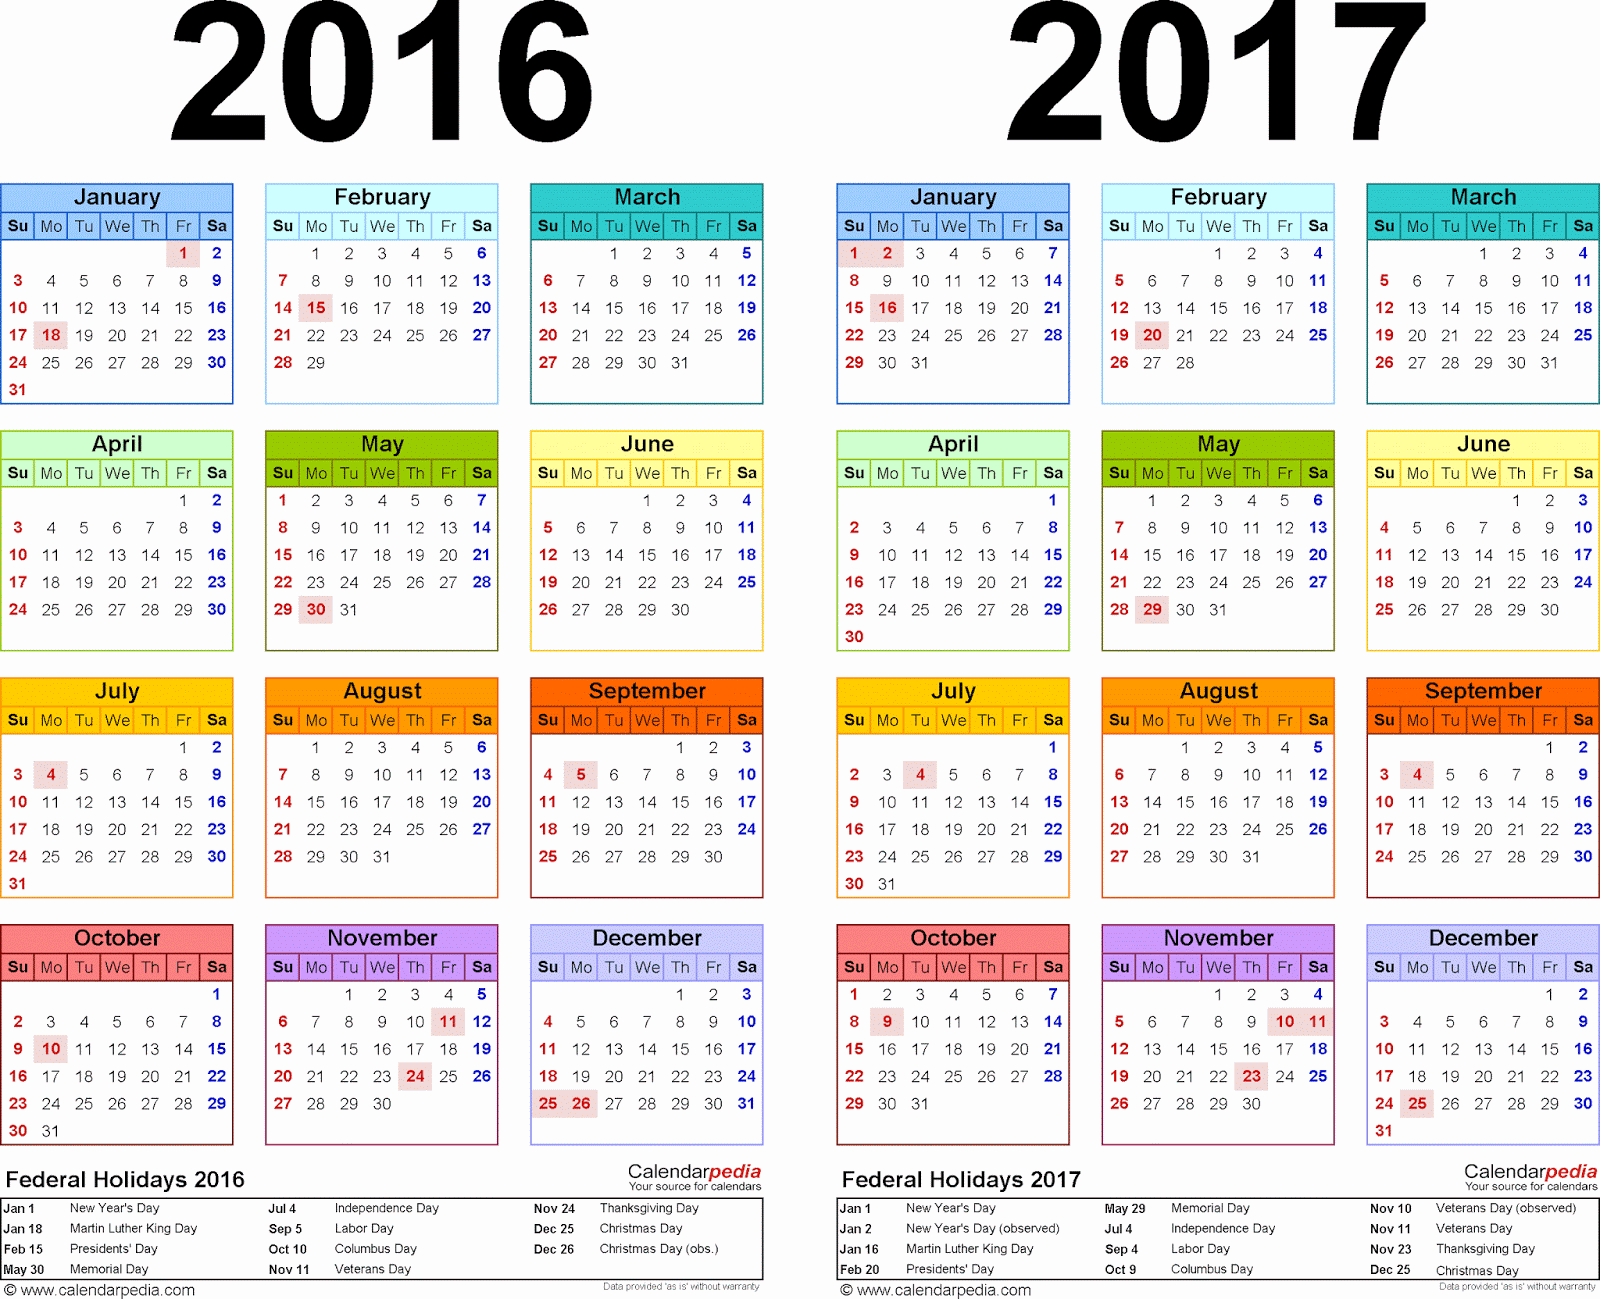 Peotone PTO: 2016-2017 School Calendar